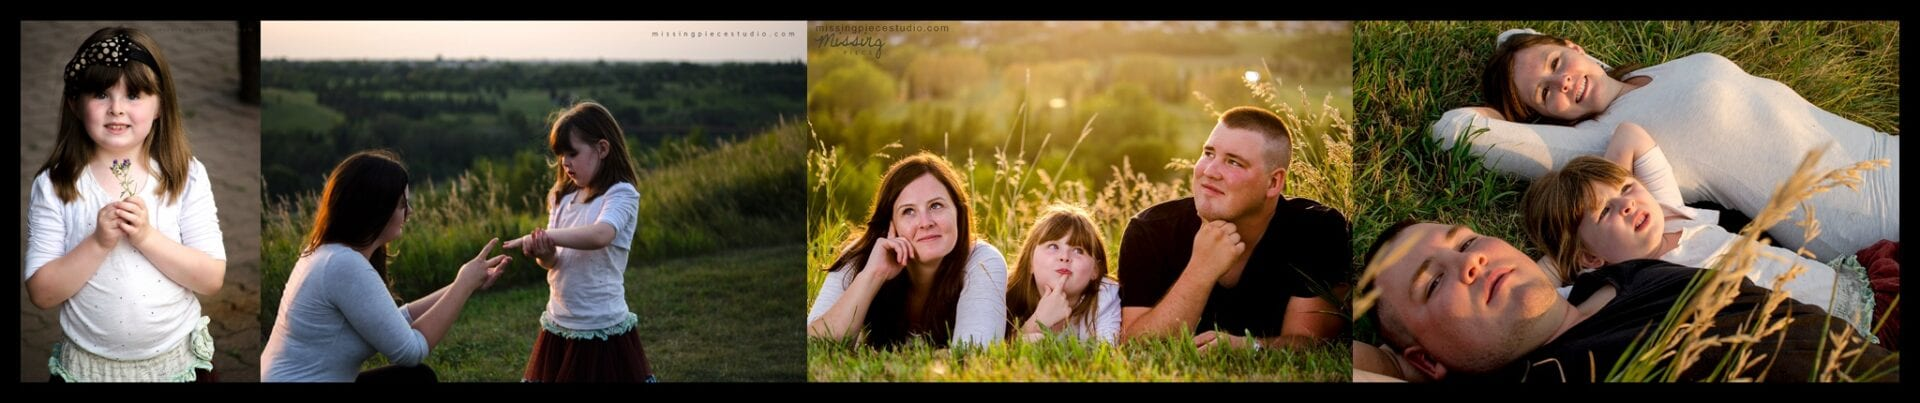 Edmonton Family Portrait Photography Candid-collage016